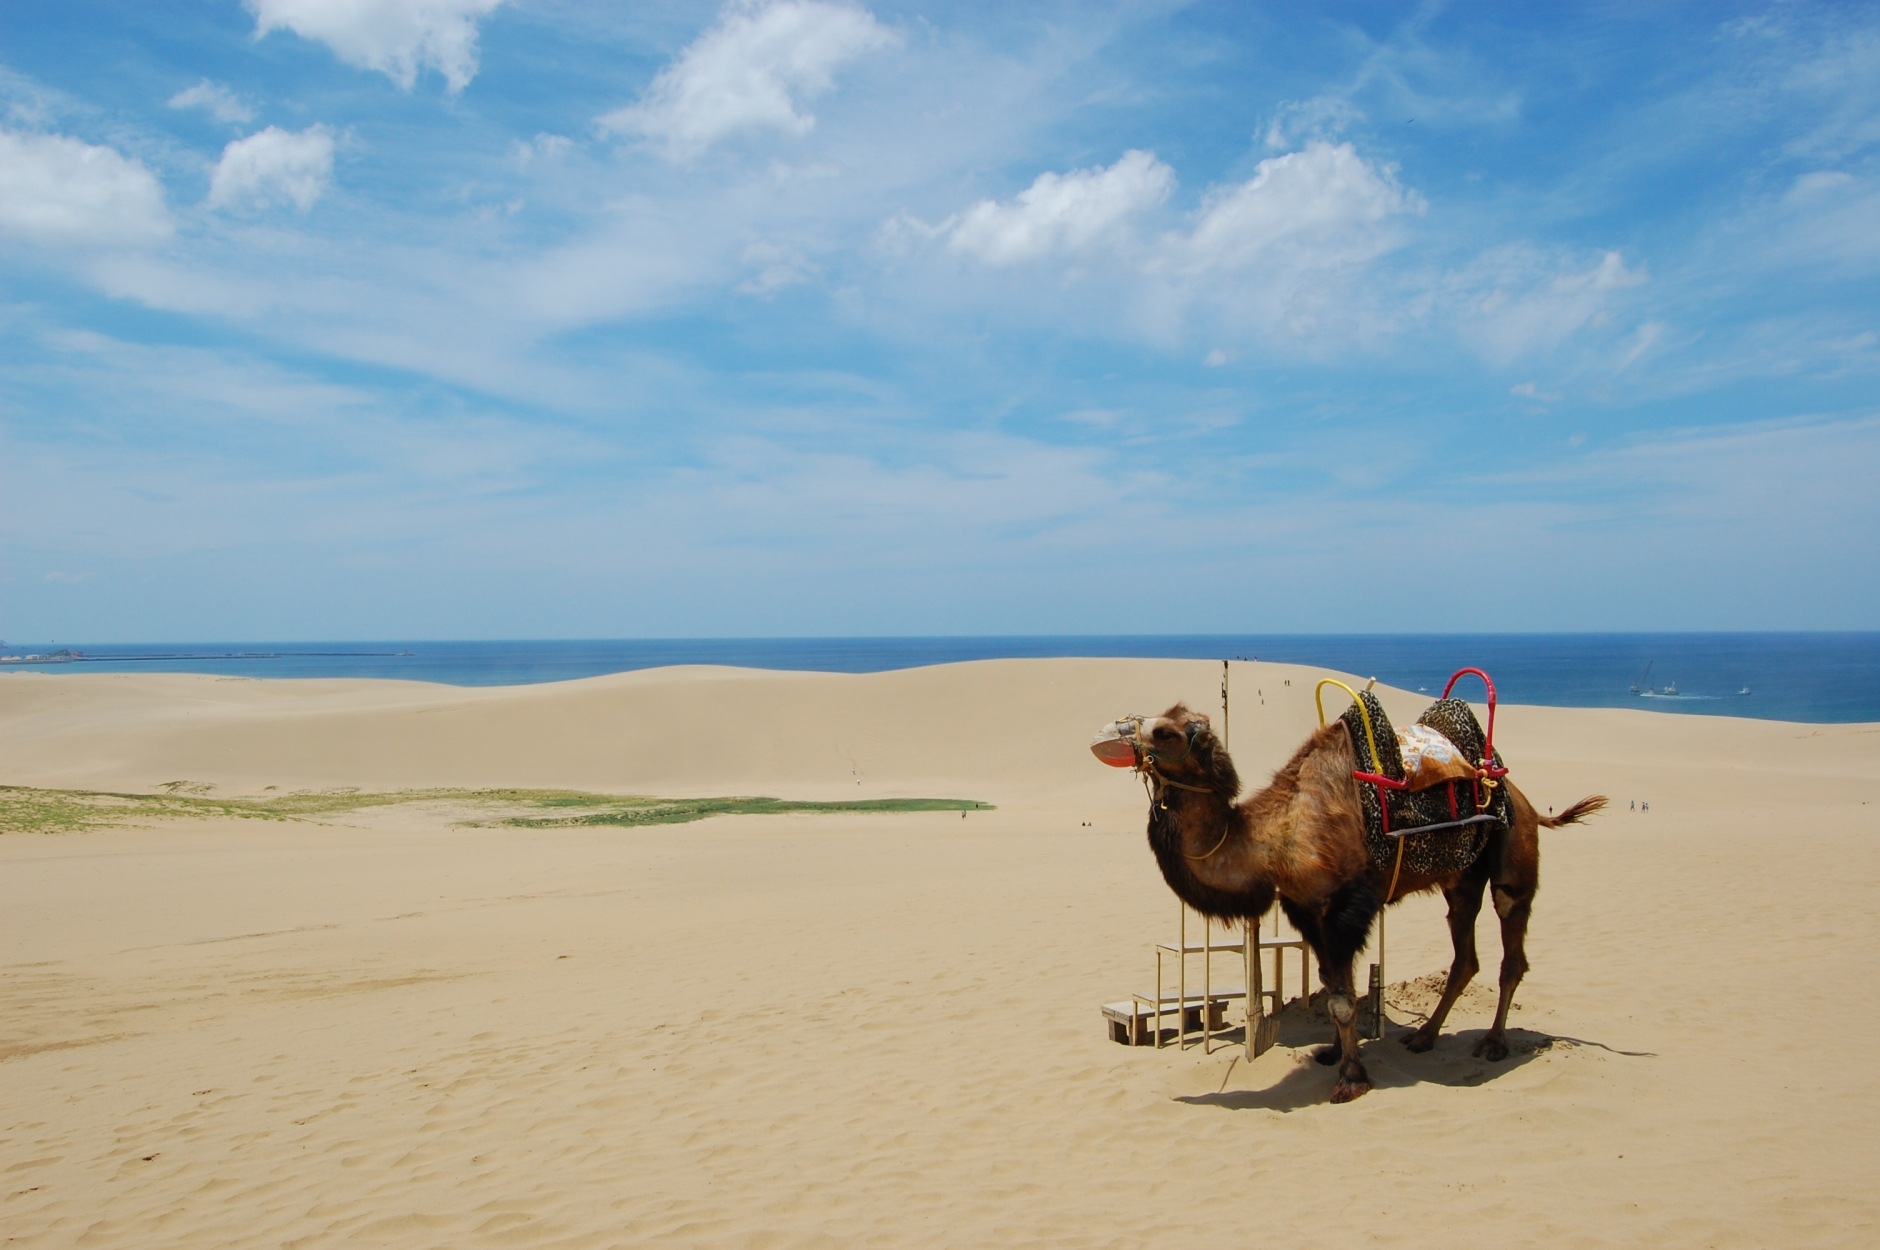 File:Tottori sanddunes camel.jpg - Wikimedia Commons